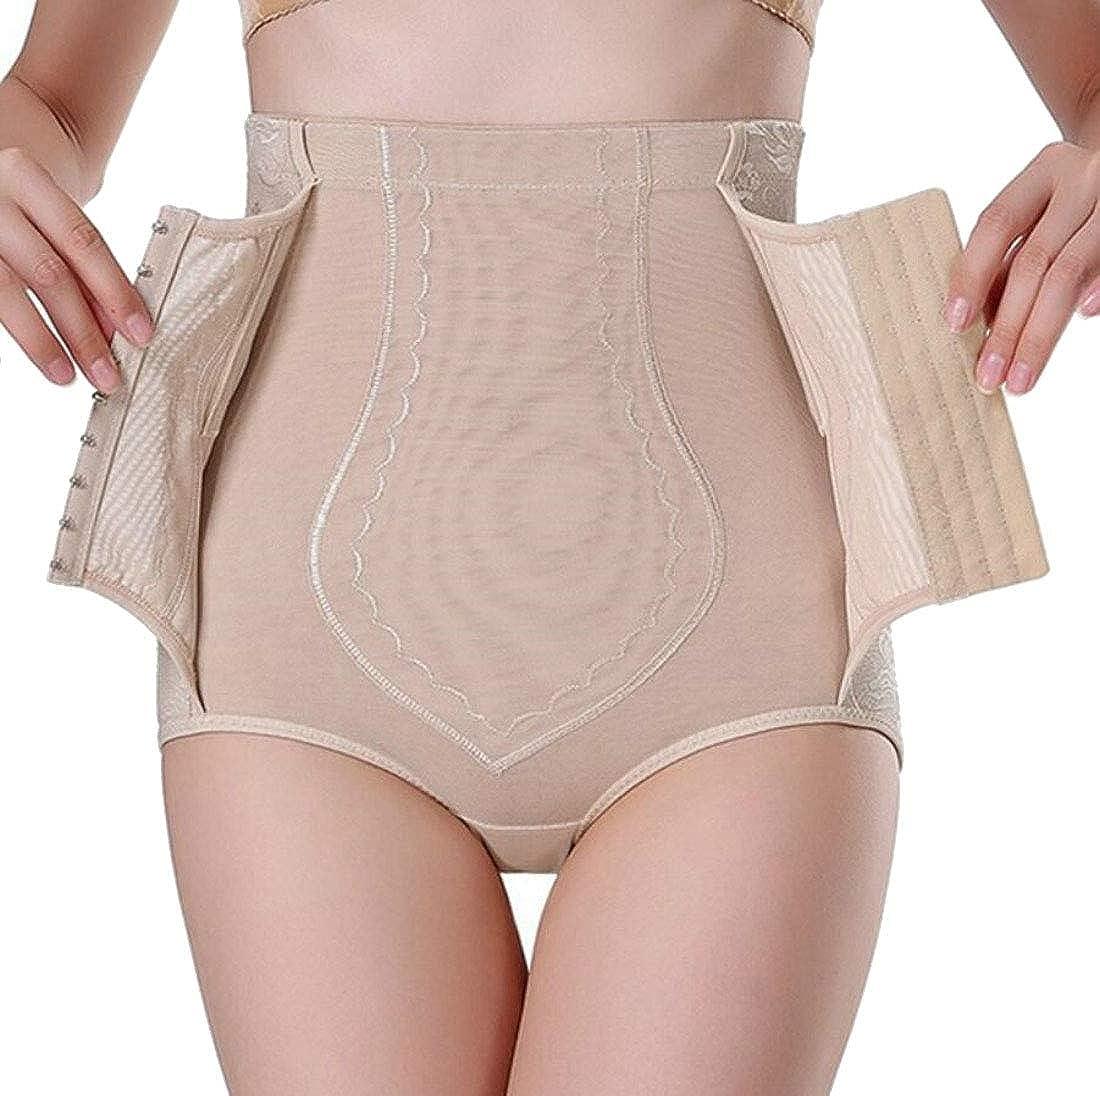 Women Shapewear Panties Body Shaper High Waist Tummy Control Slimming Briefs